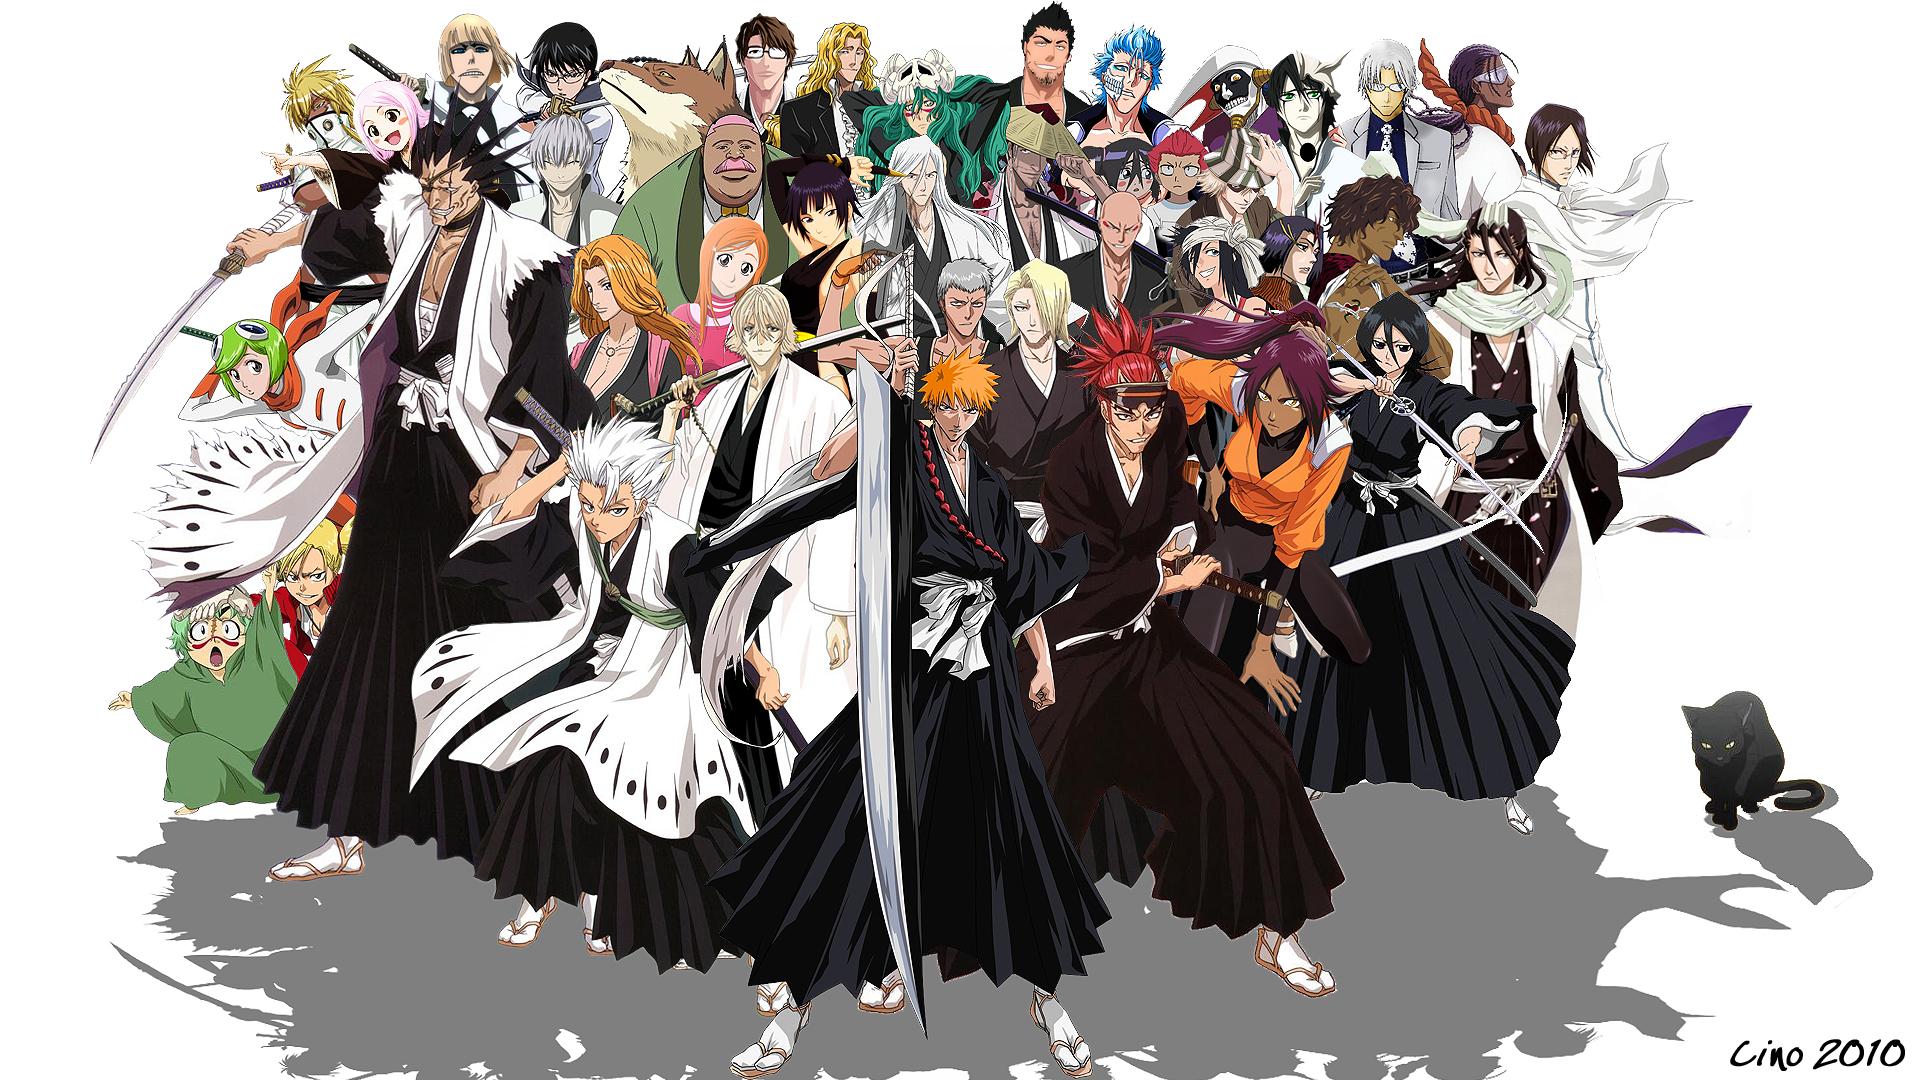 Ichigo Kurosaki Bleach CHaracters Anime Pictures Gallery Wallpapers HD 1920x1080